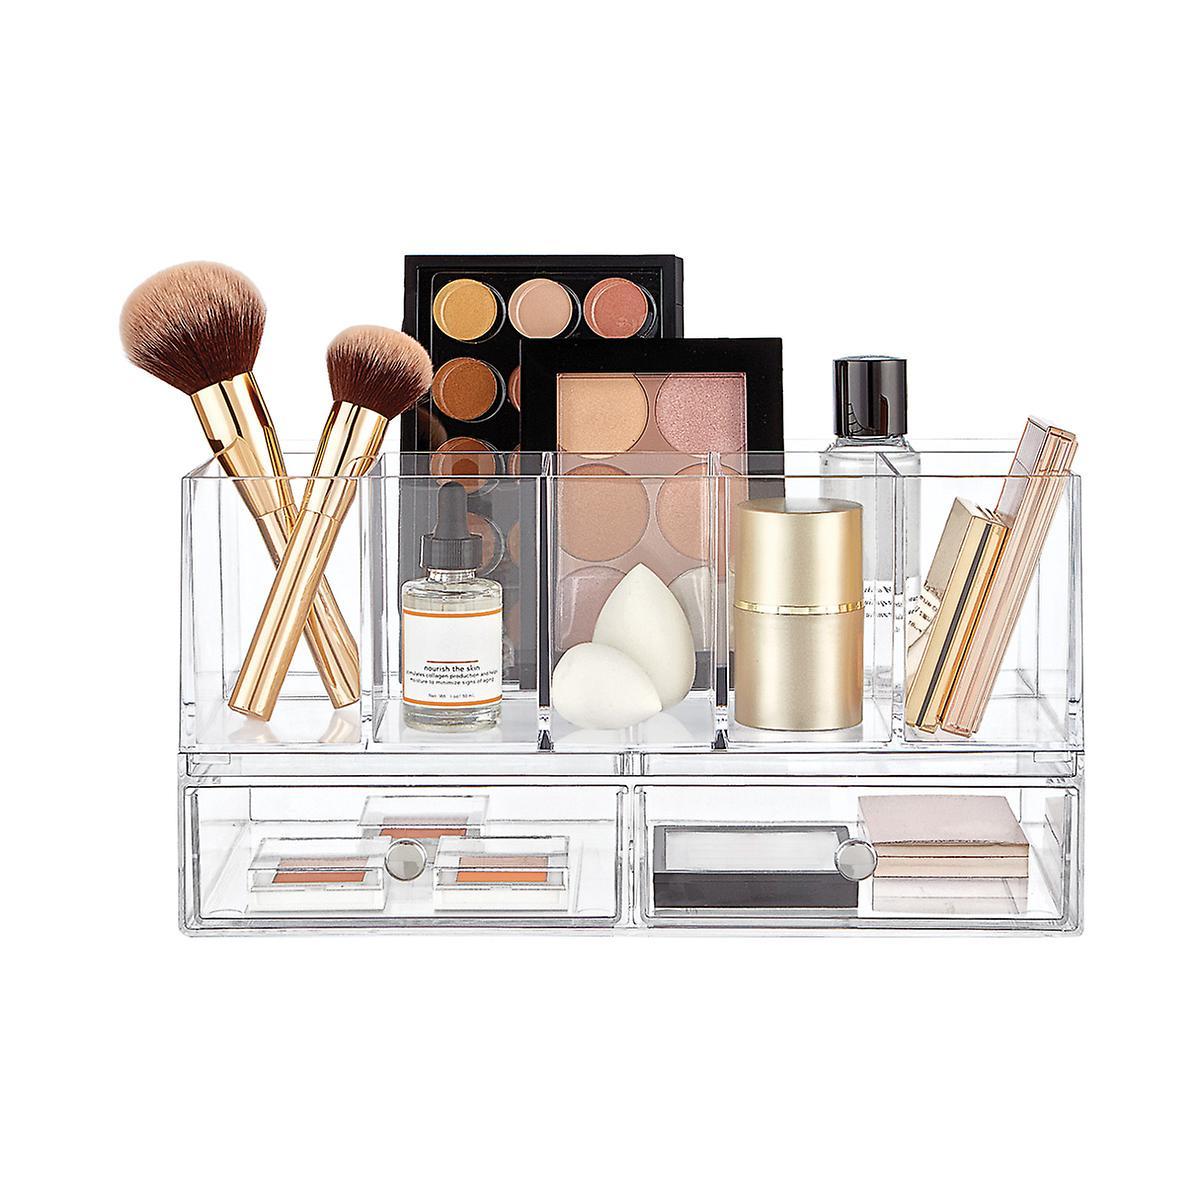 ee0cb9914757 InterDesign Clarity Stackable Makeup System